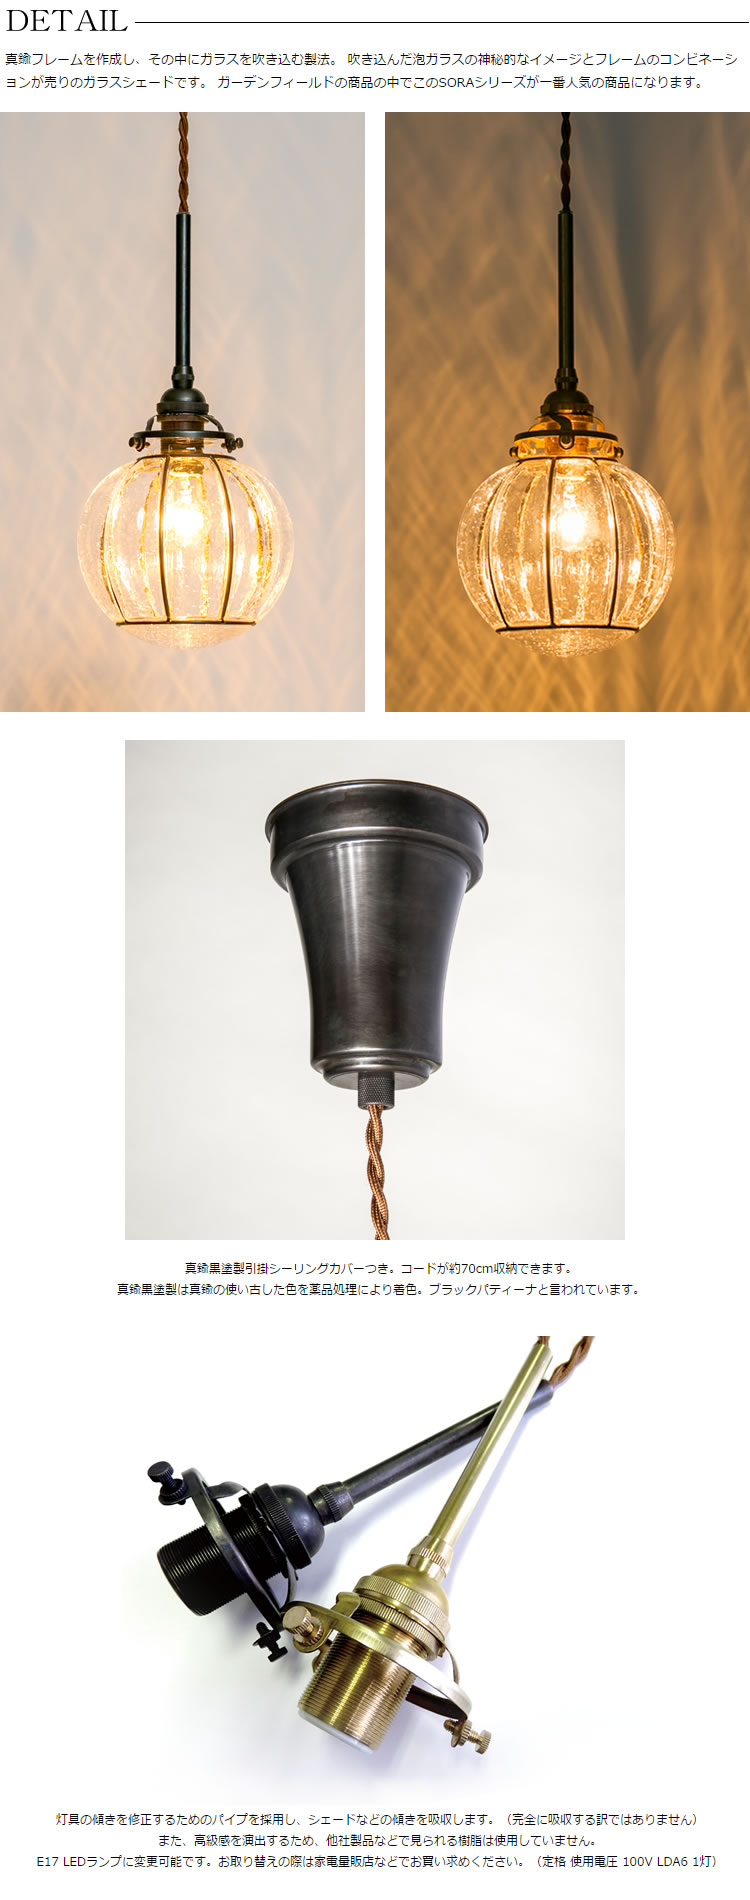 SORA(泡入りガラス・引掛・真鍮黒染)